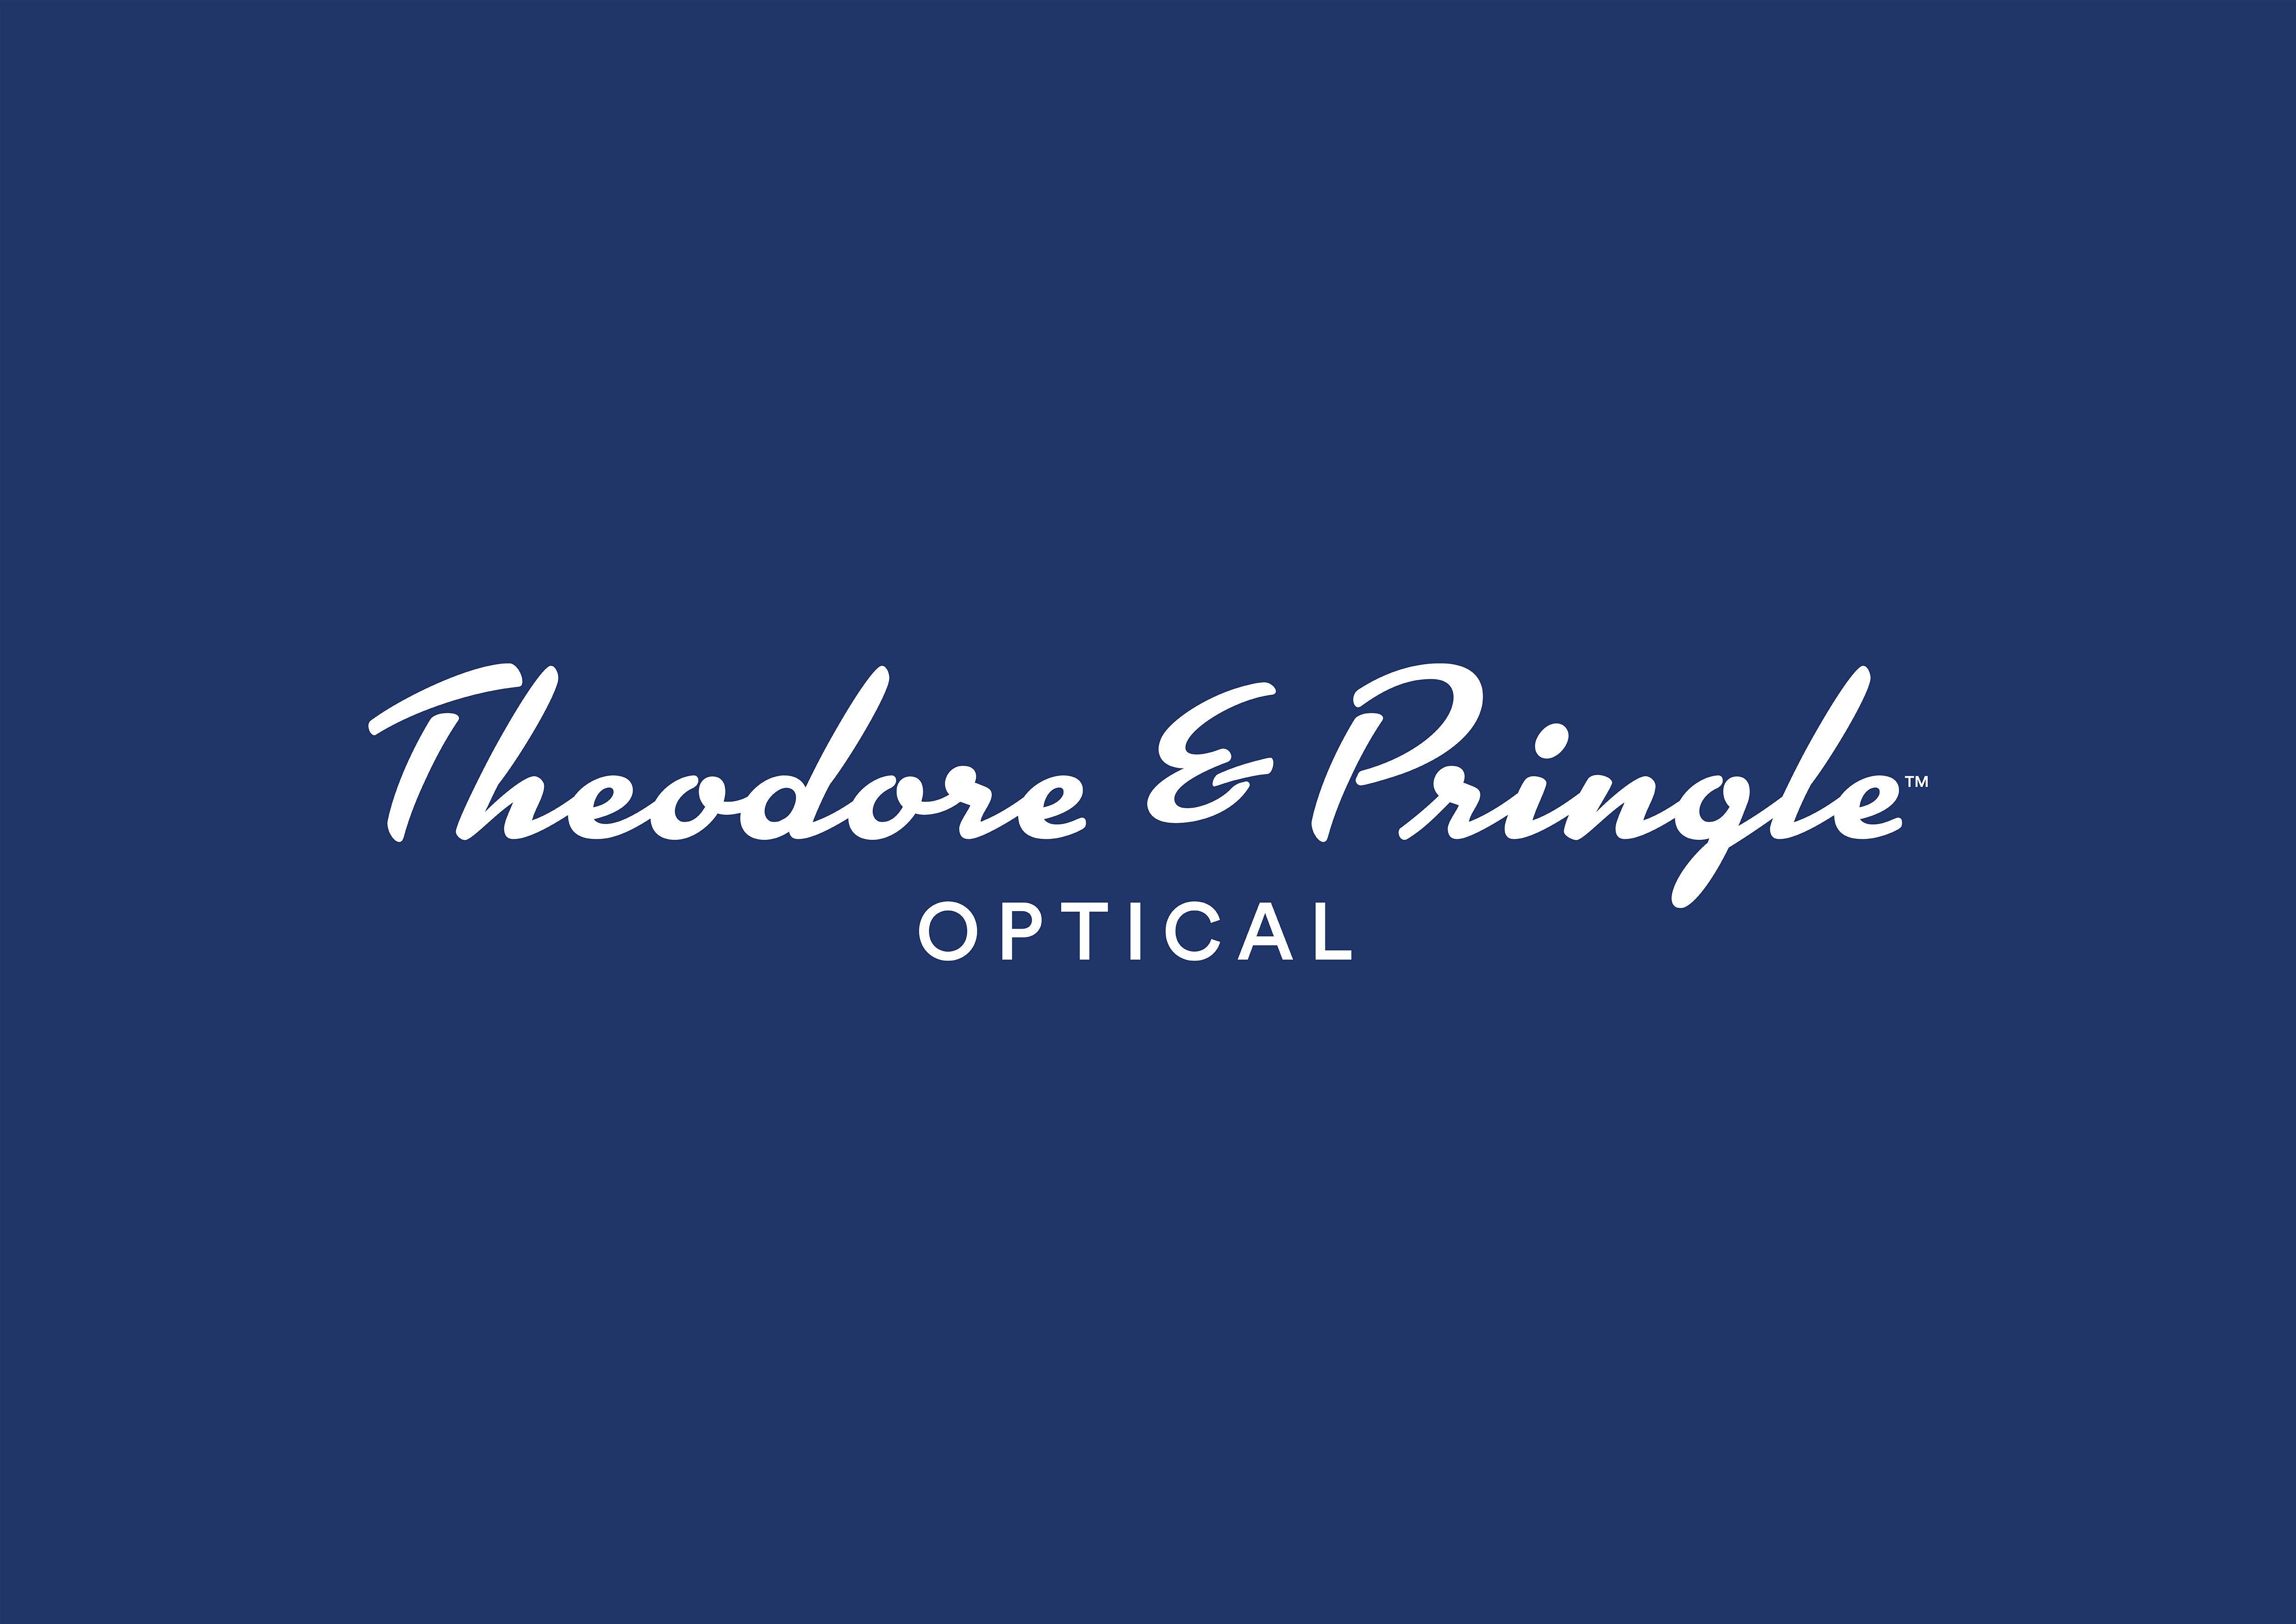 Theodore & Pringle Optical in Loblaws | 100 McArthur Ave, Ottawa, ON K1L 6P9 | +1 613-744-0705